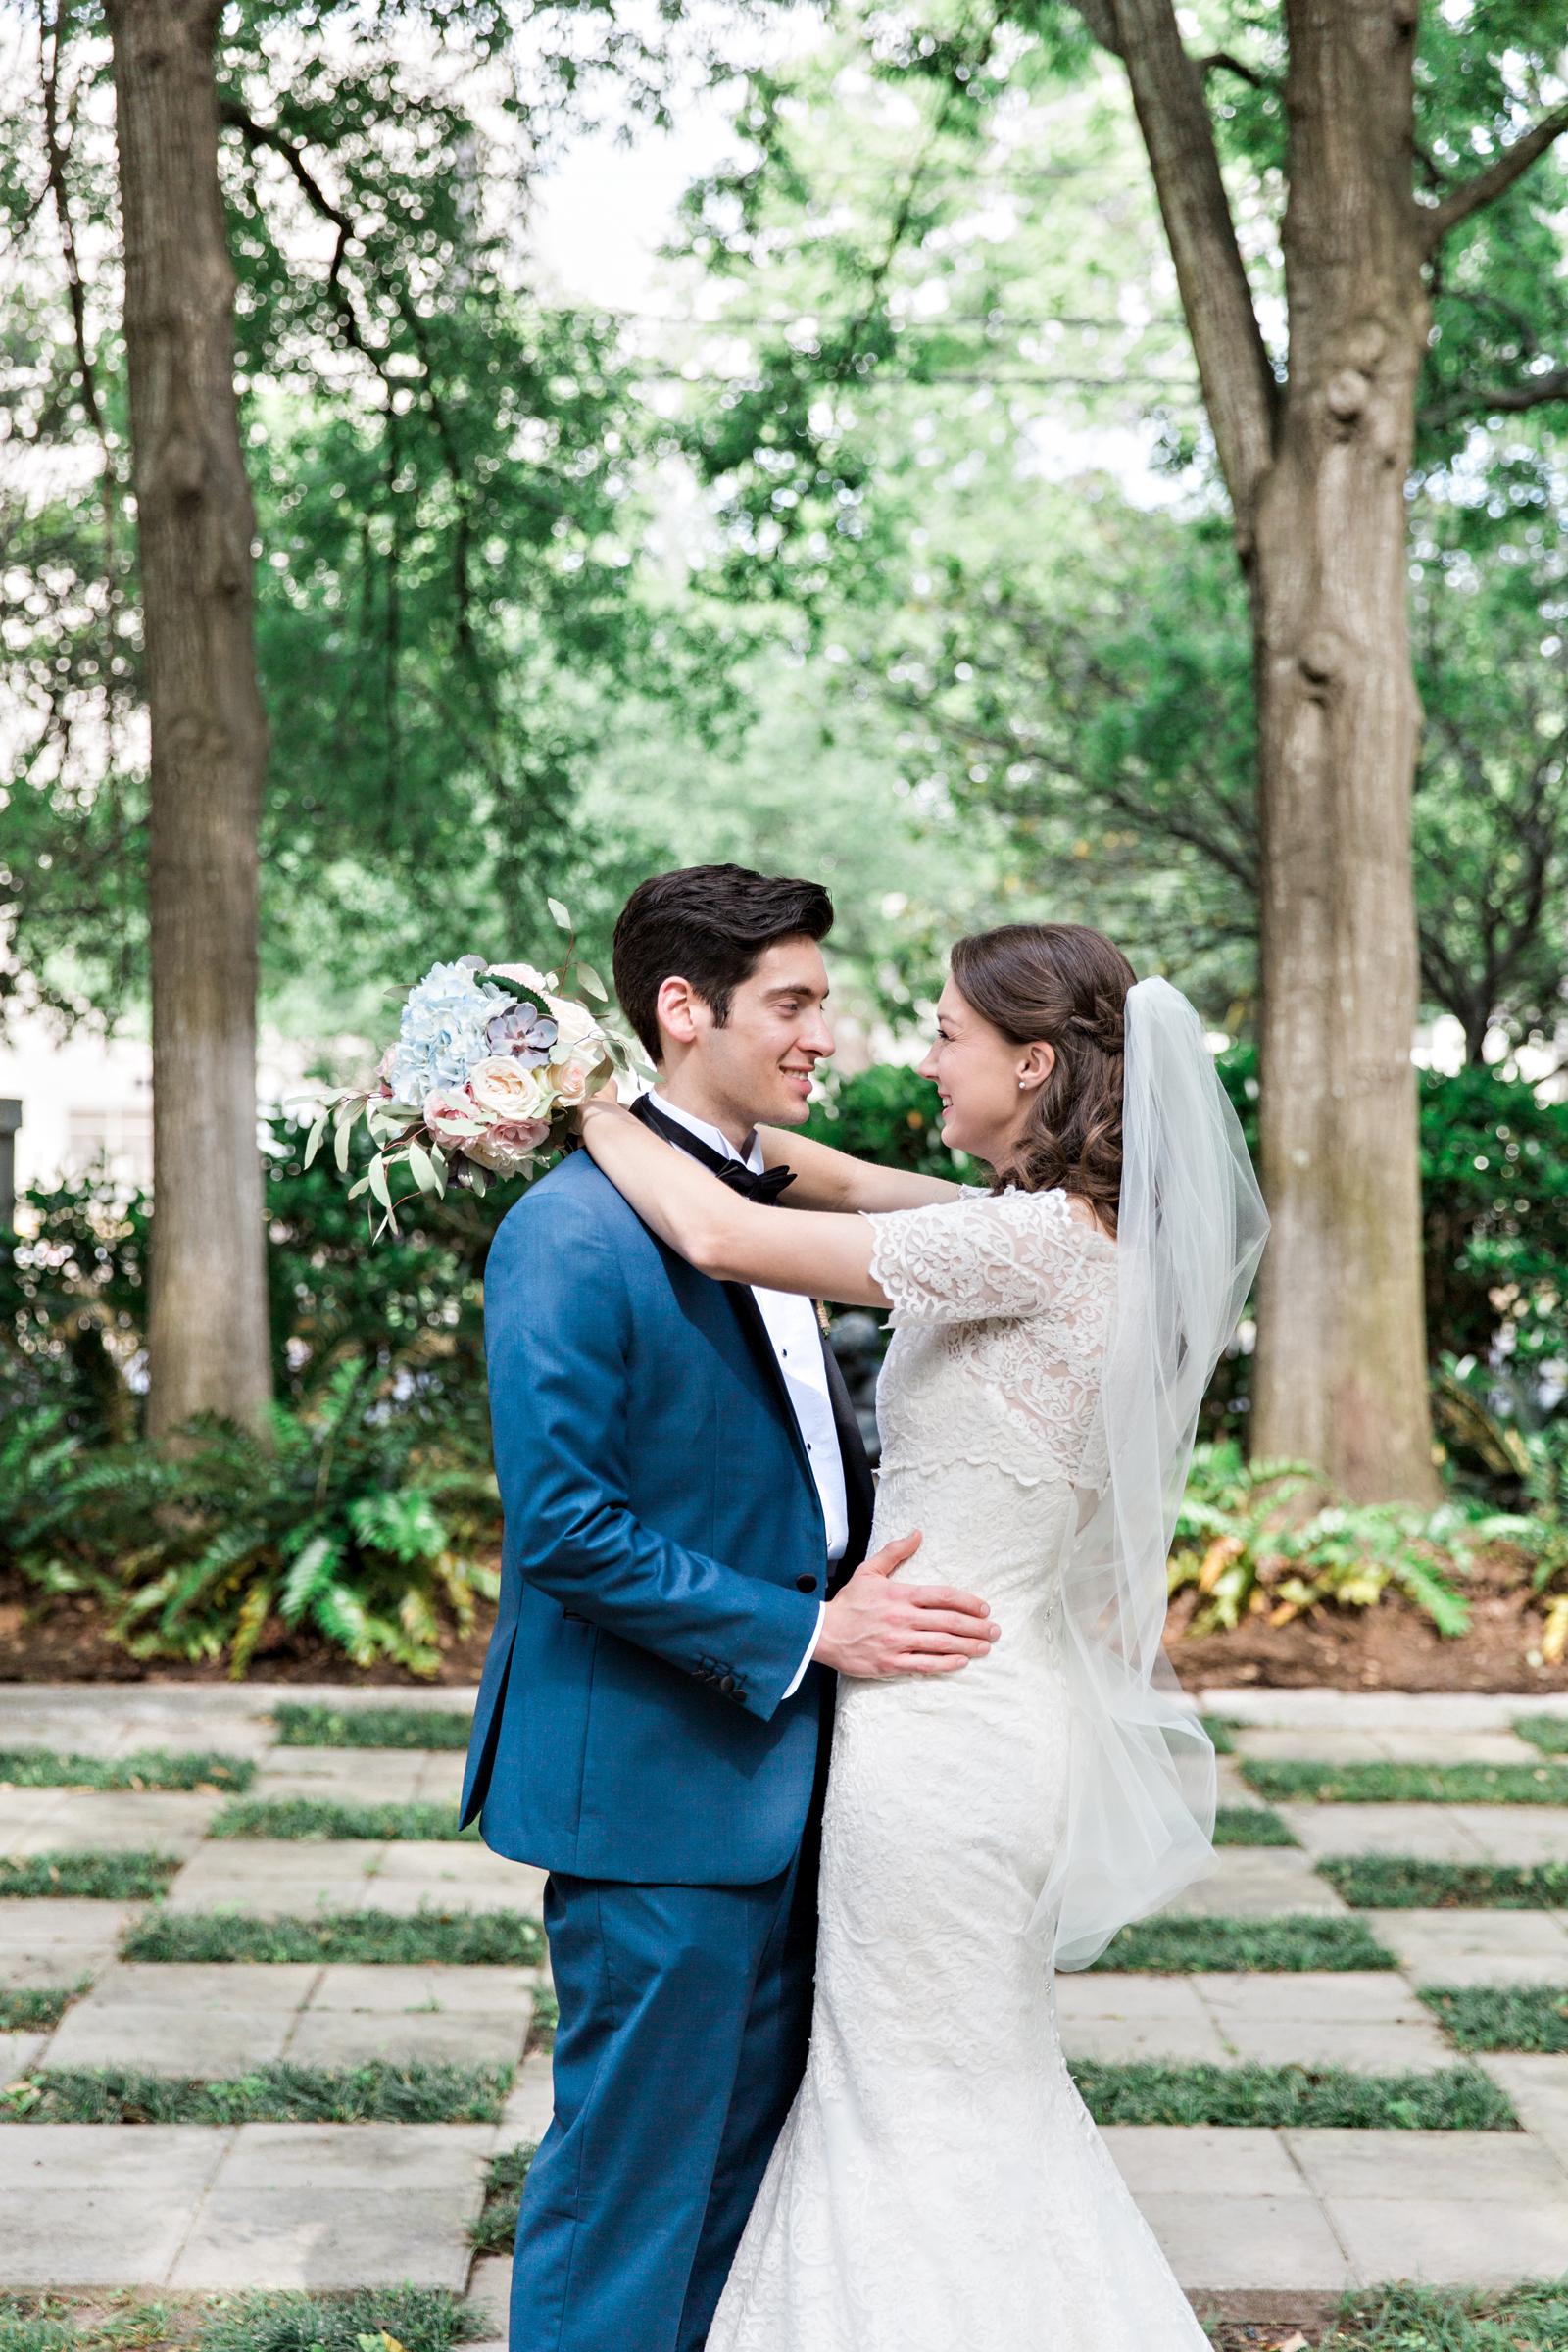 Ni ck-Drollette-Photography-Montgomery-Alabama-Weddings-143.jpg